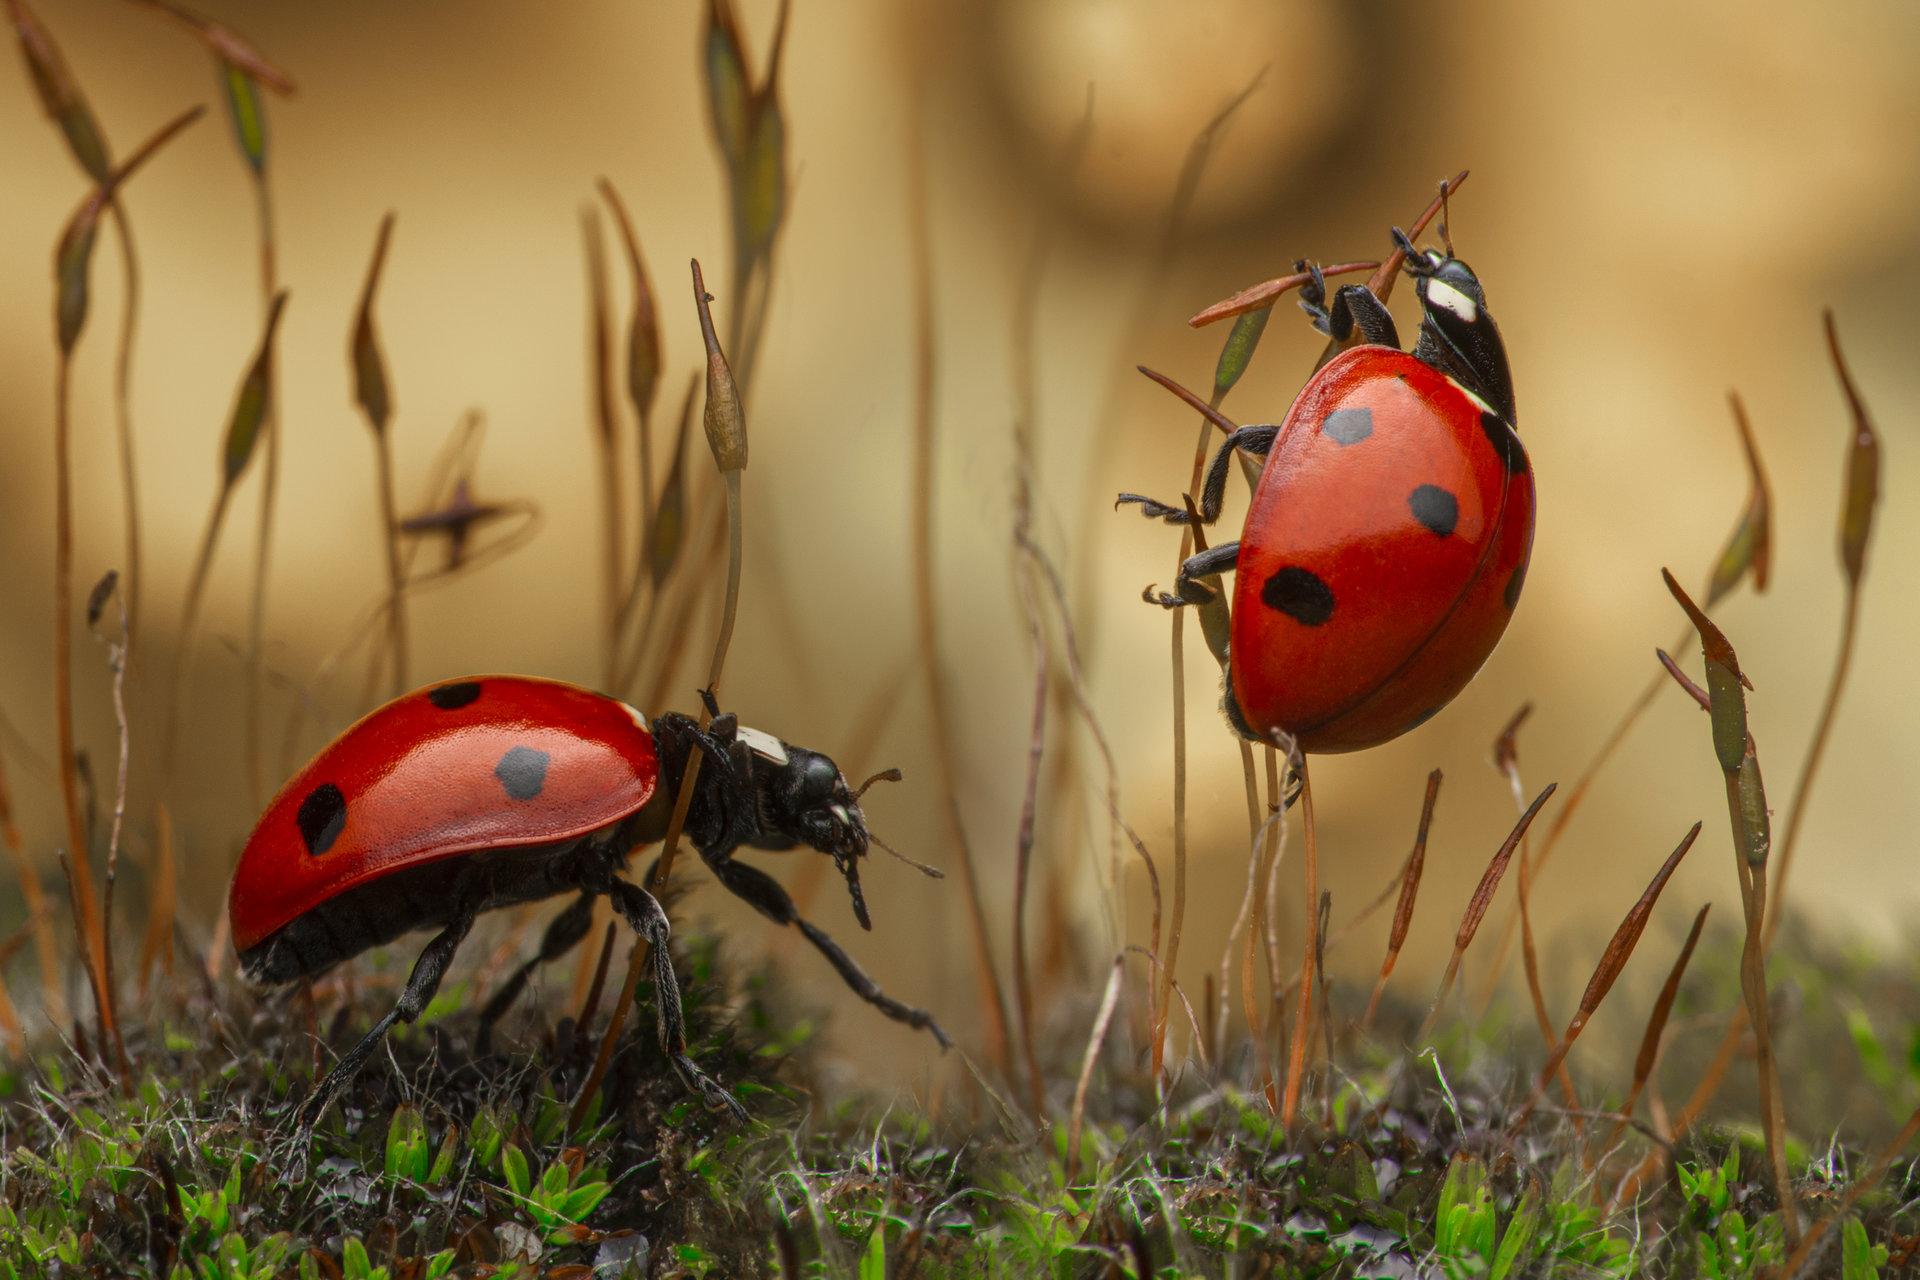 Photo in Color harmony | Author Tsvetan Ganev - ceclii | PHOTO FORUM